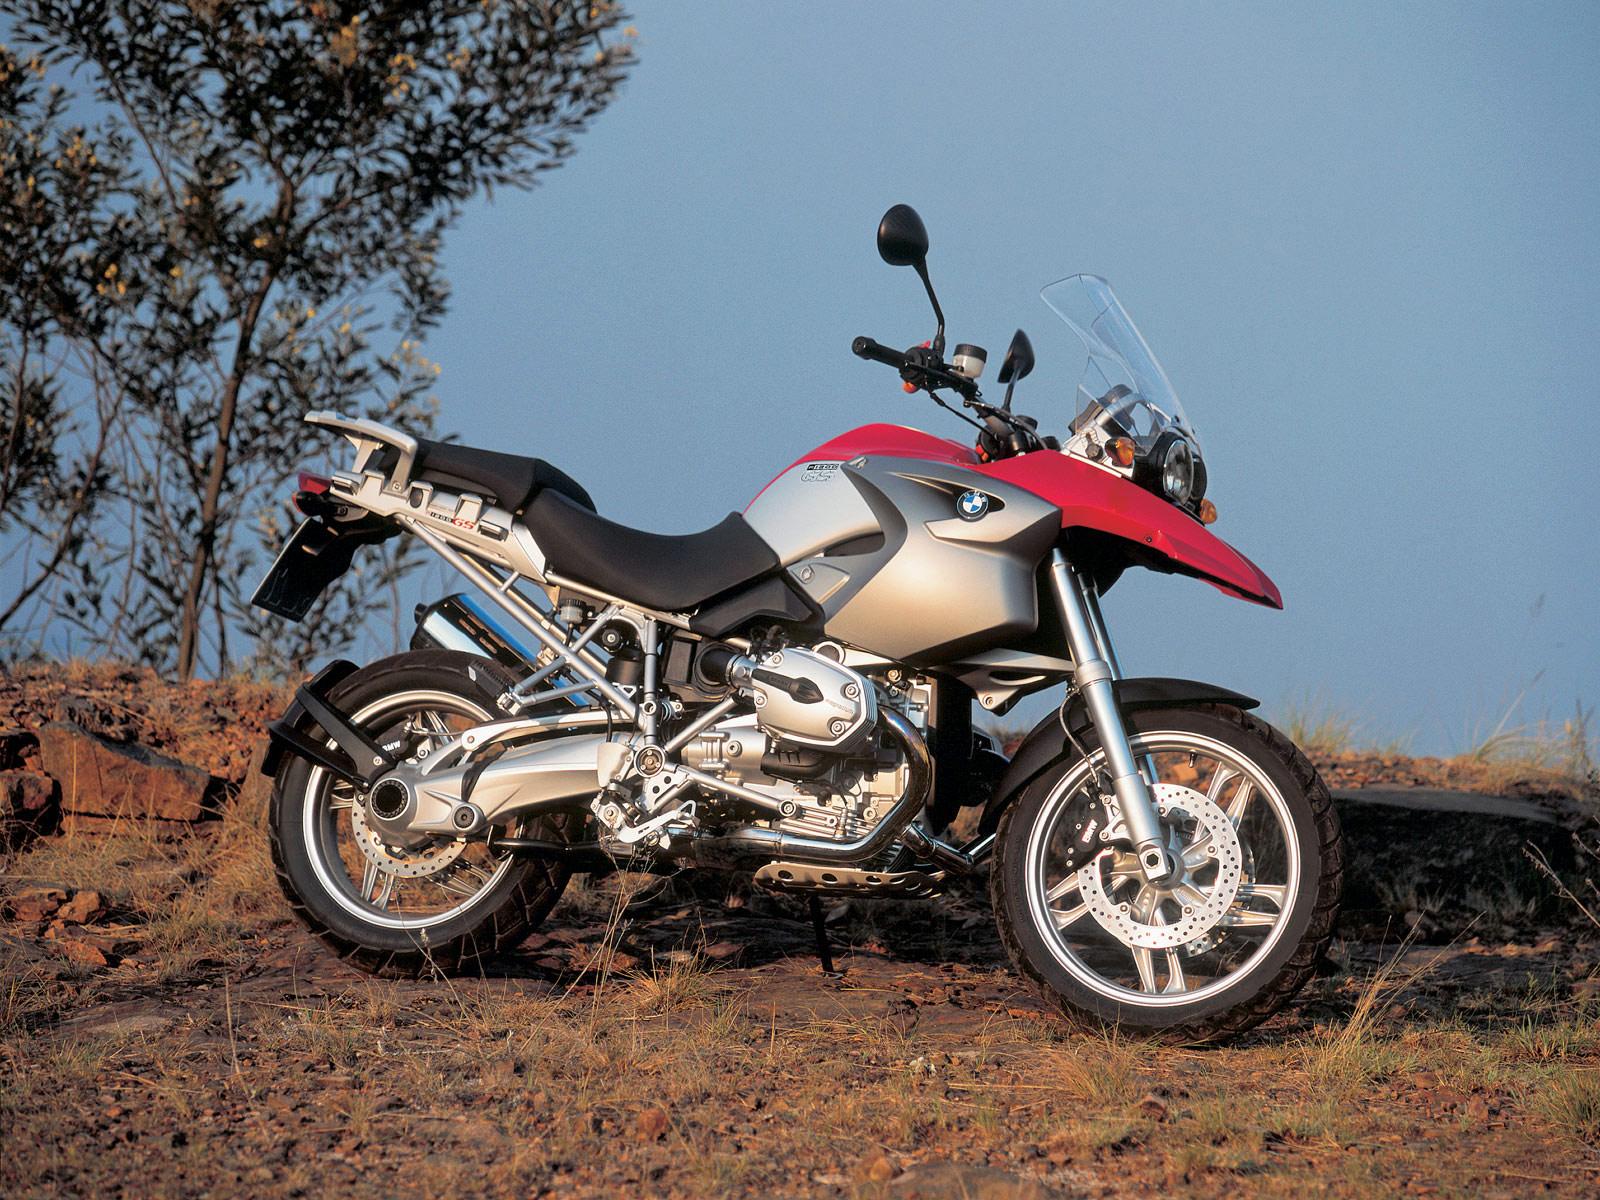 BMW R 1200 GS Motorcycle Desktop Wallpaper. Accident